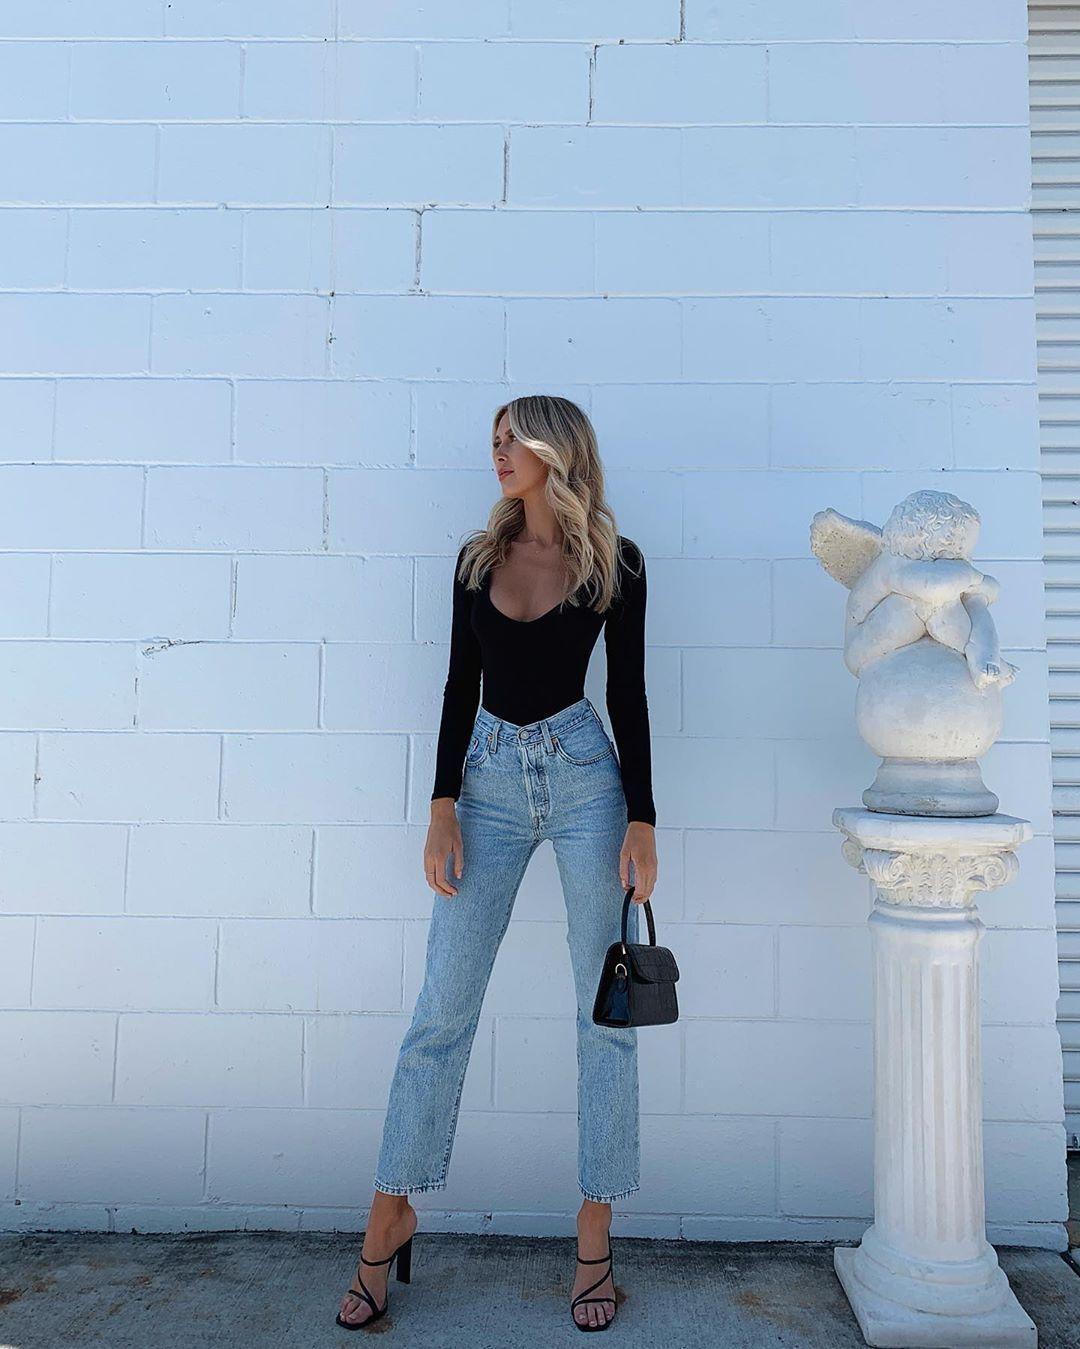 Photo of black body + straight jeans + heels